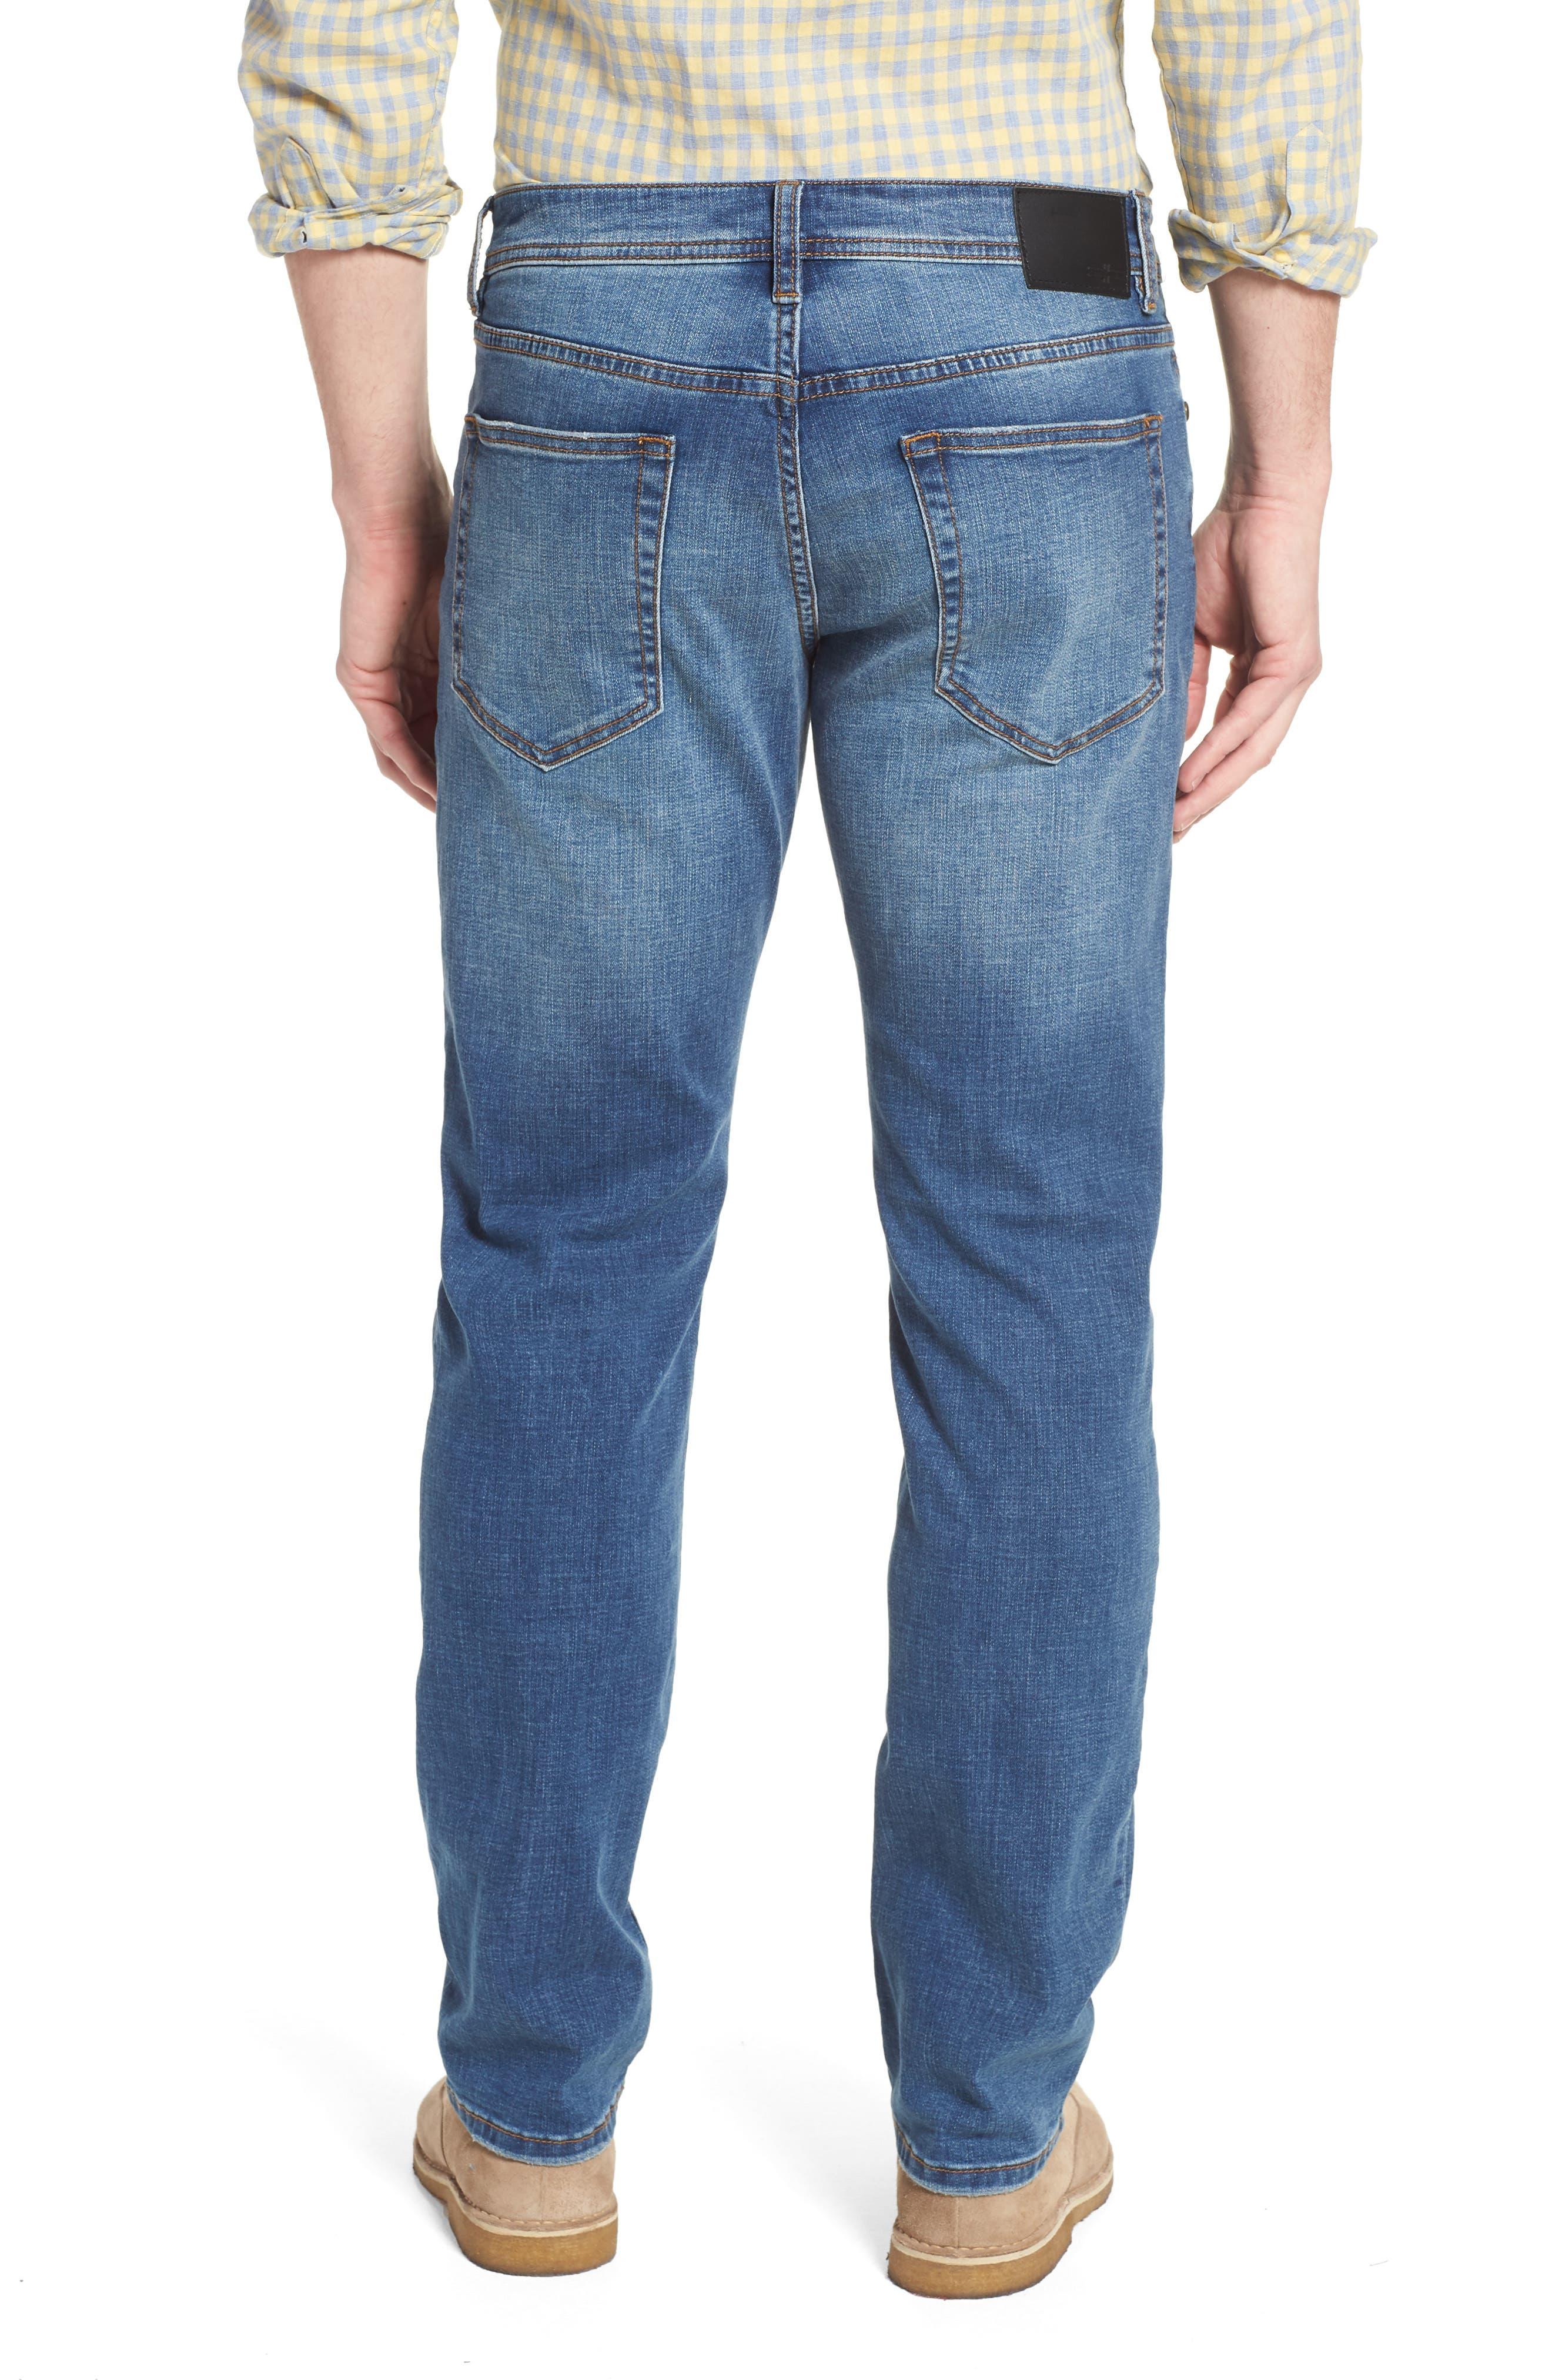 Jeans Co. Regent Relaxed Straight Leg Jeans,                             Alternate thumbnail 2, color,                             Highlander Mid